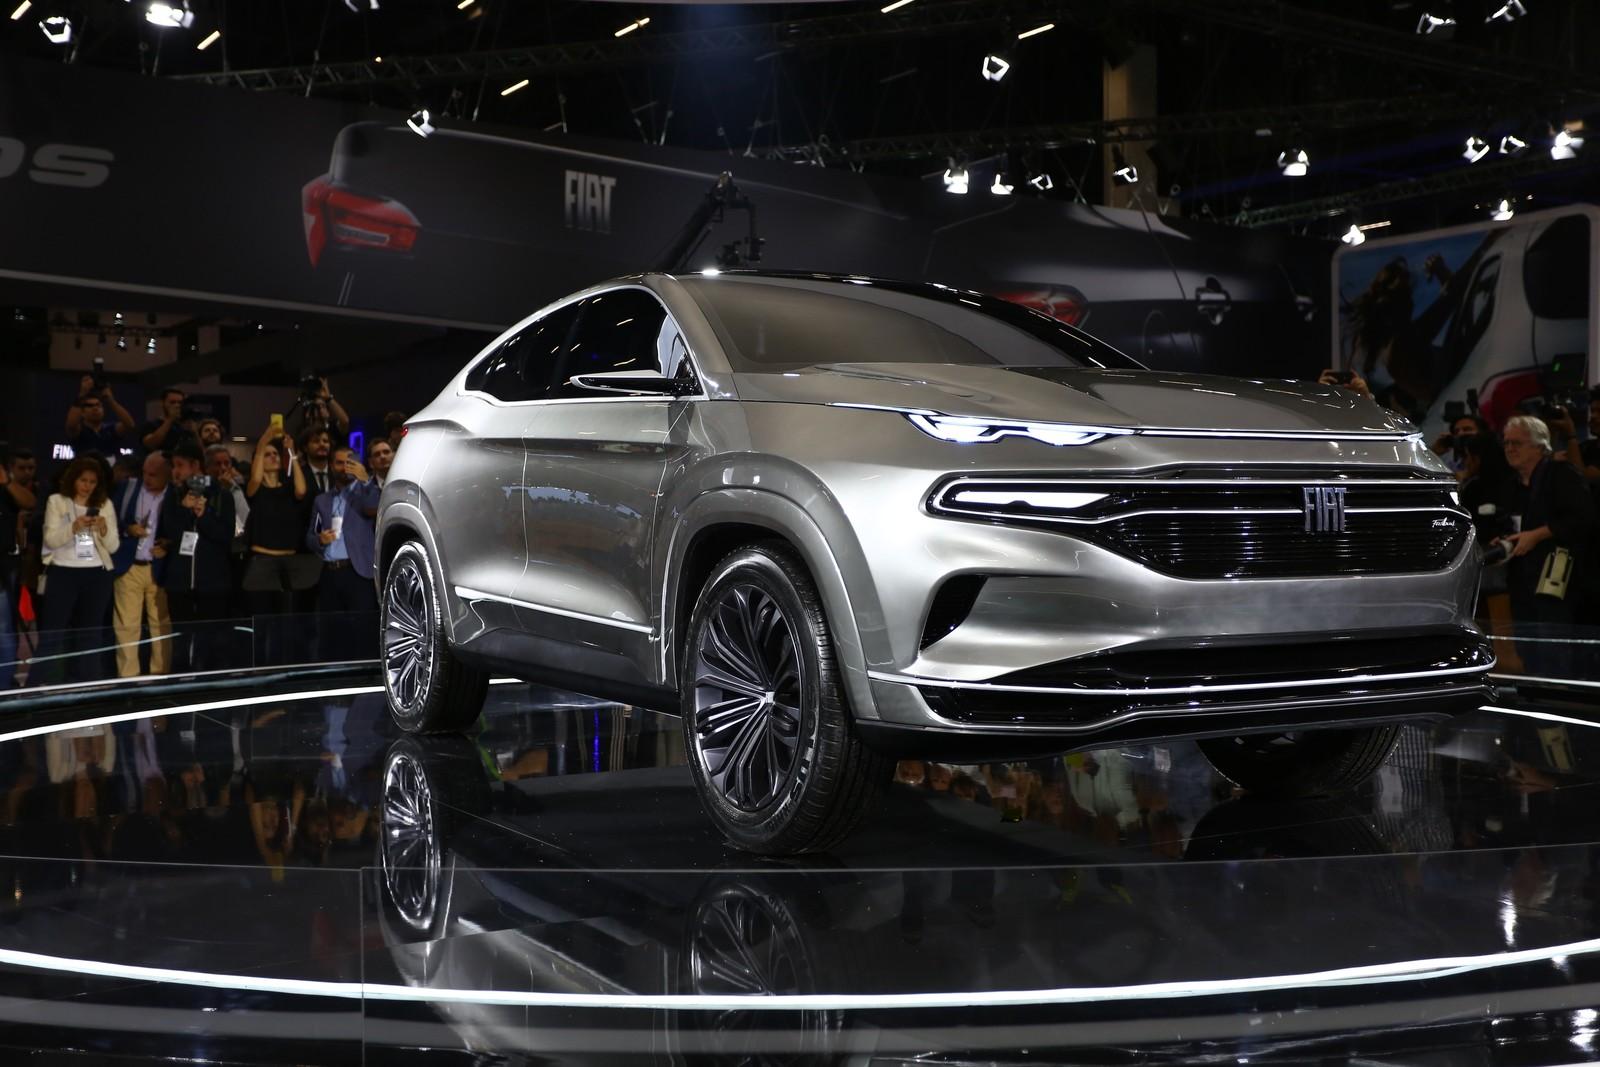 Fiat predstavio Fastback Toro koncept na Salonu automobila u Sao Paolu (VIDEO)